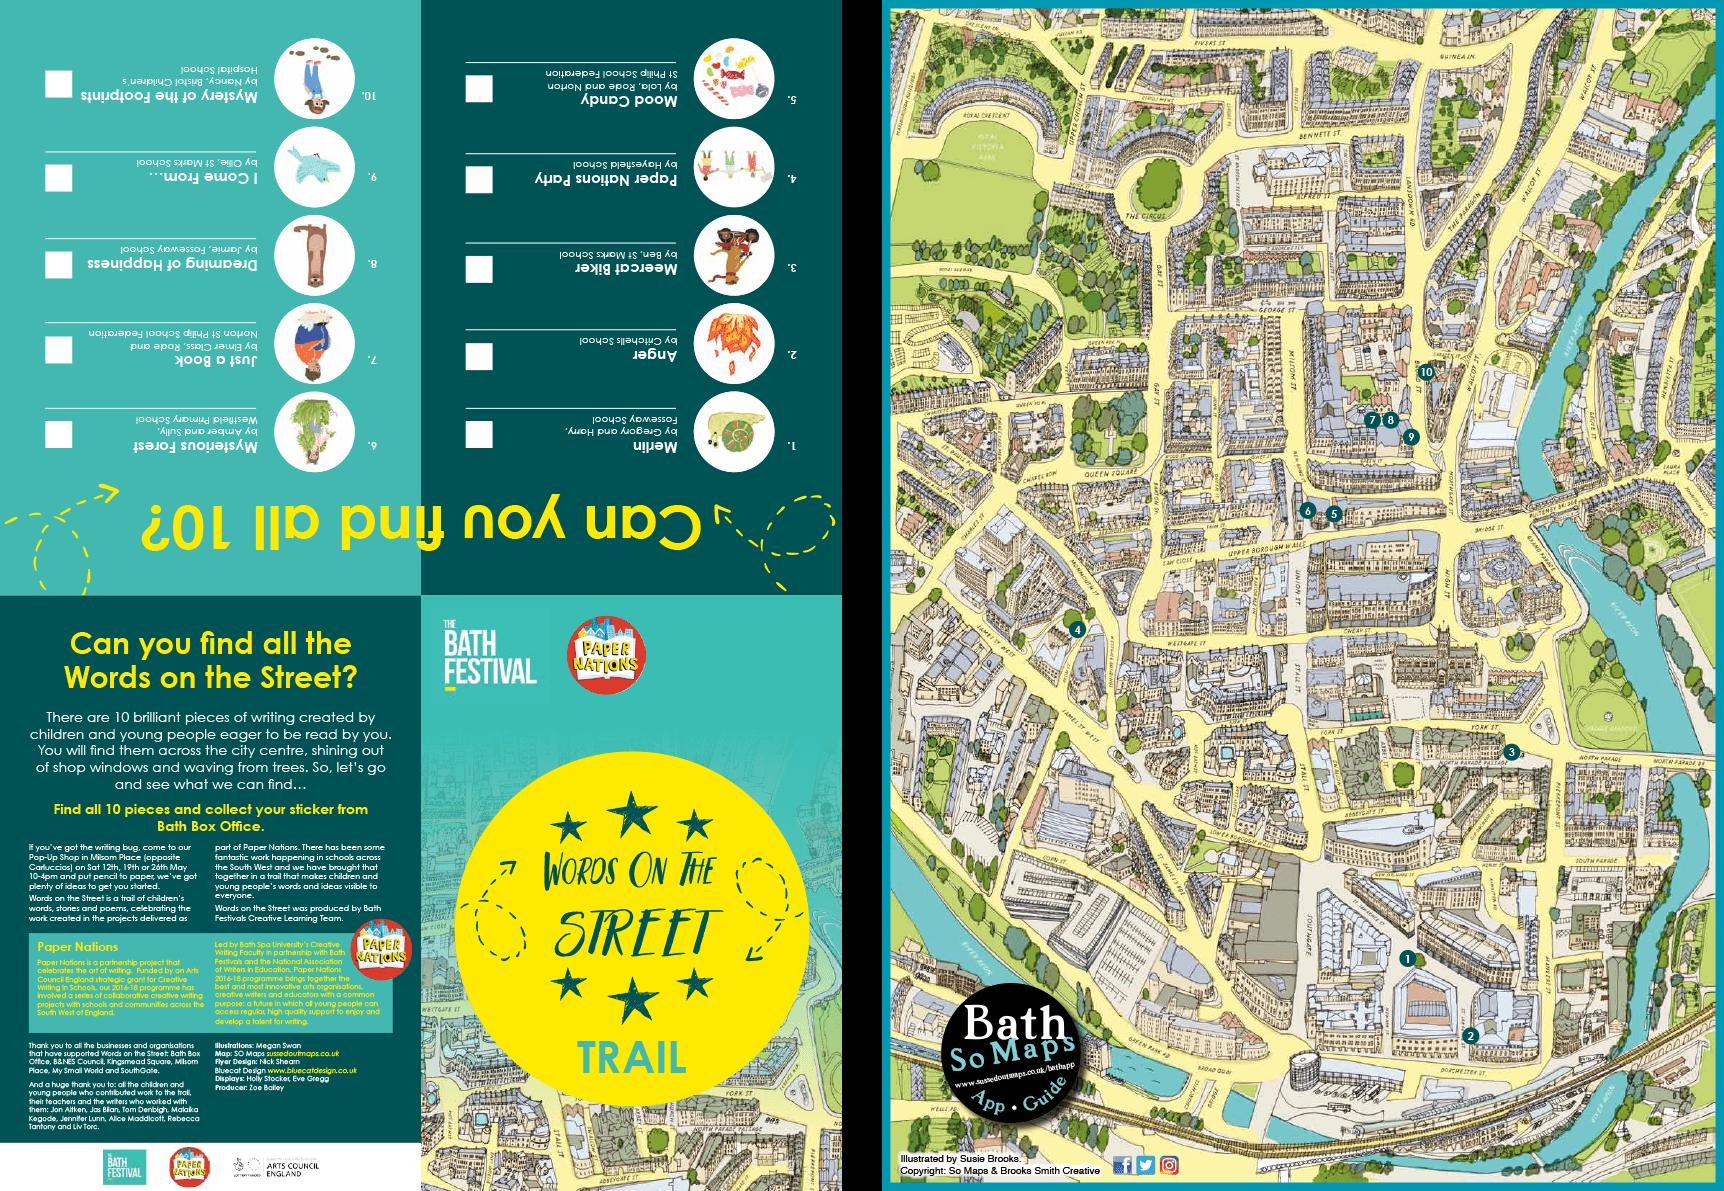 Bath Festival: Words on the Street Trail Map